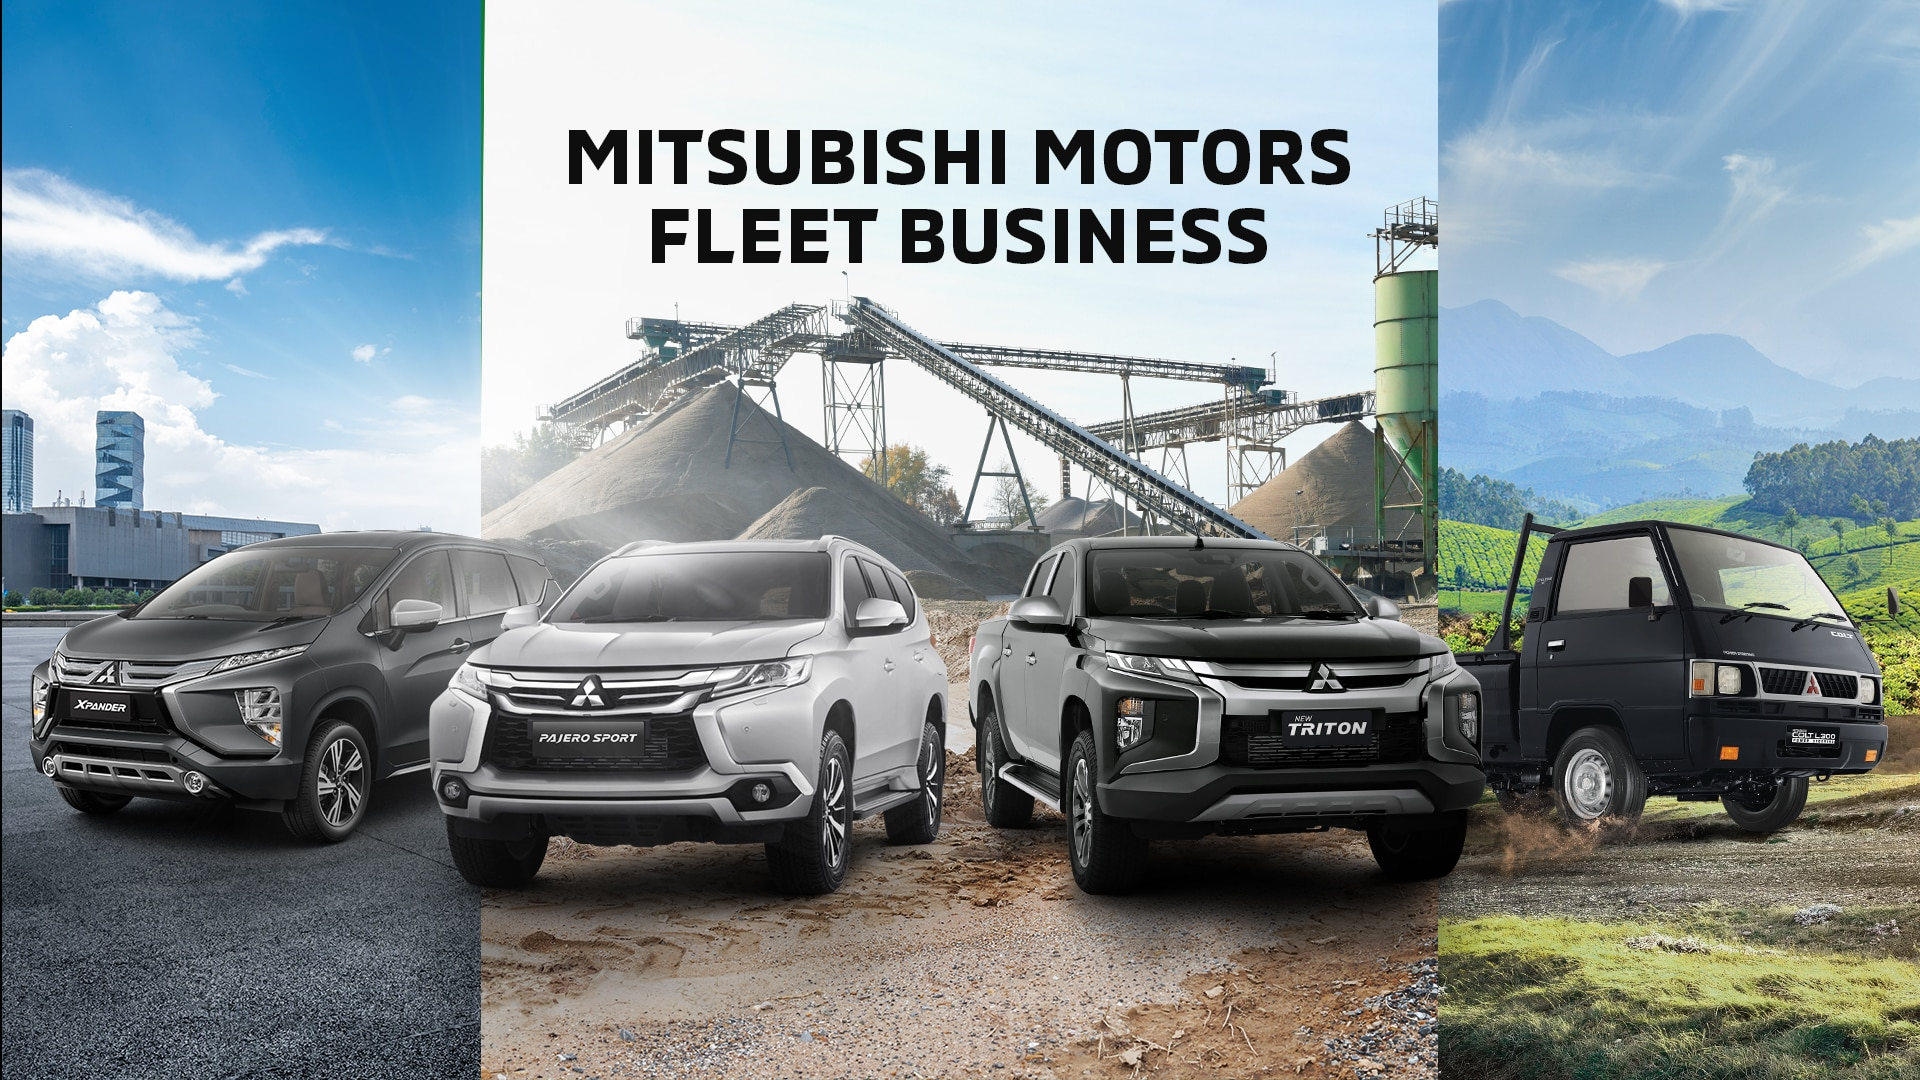 Mitsubishi Indonesia Bikin Laman Website Khusus Fleet